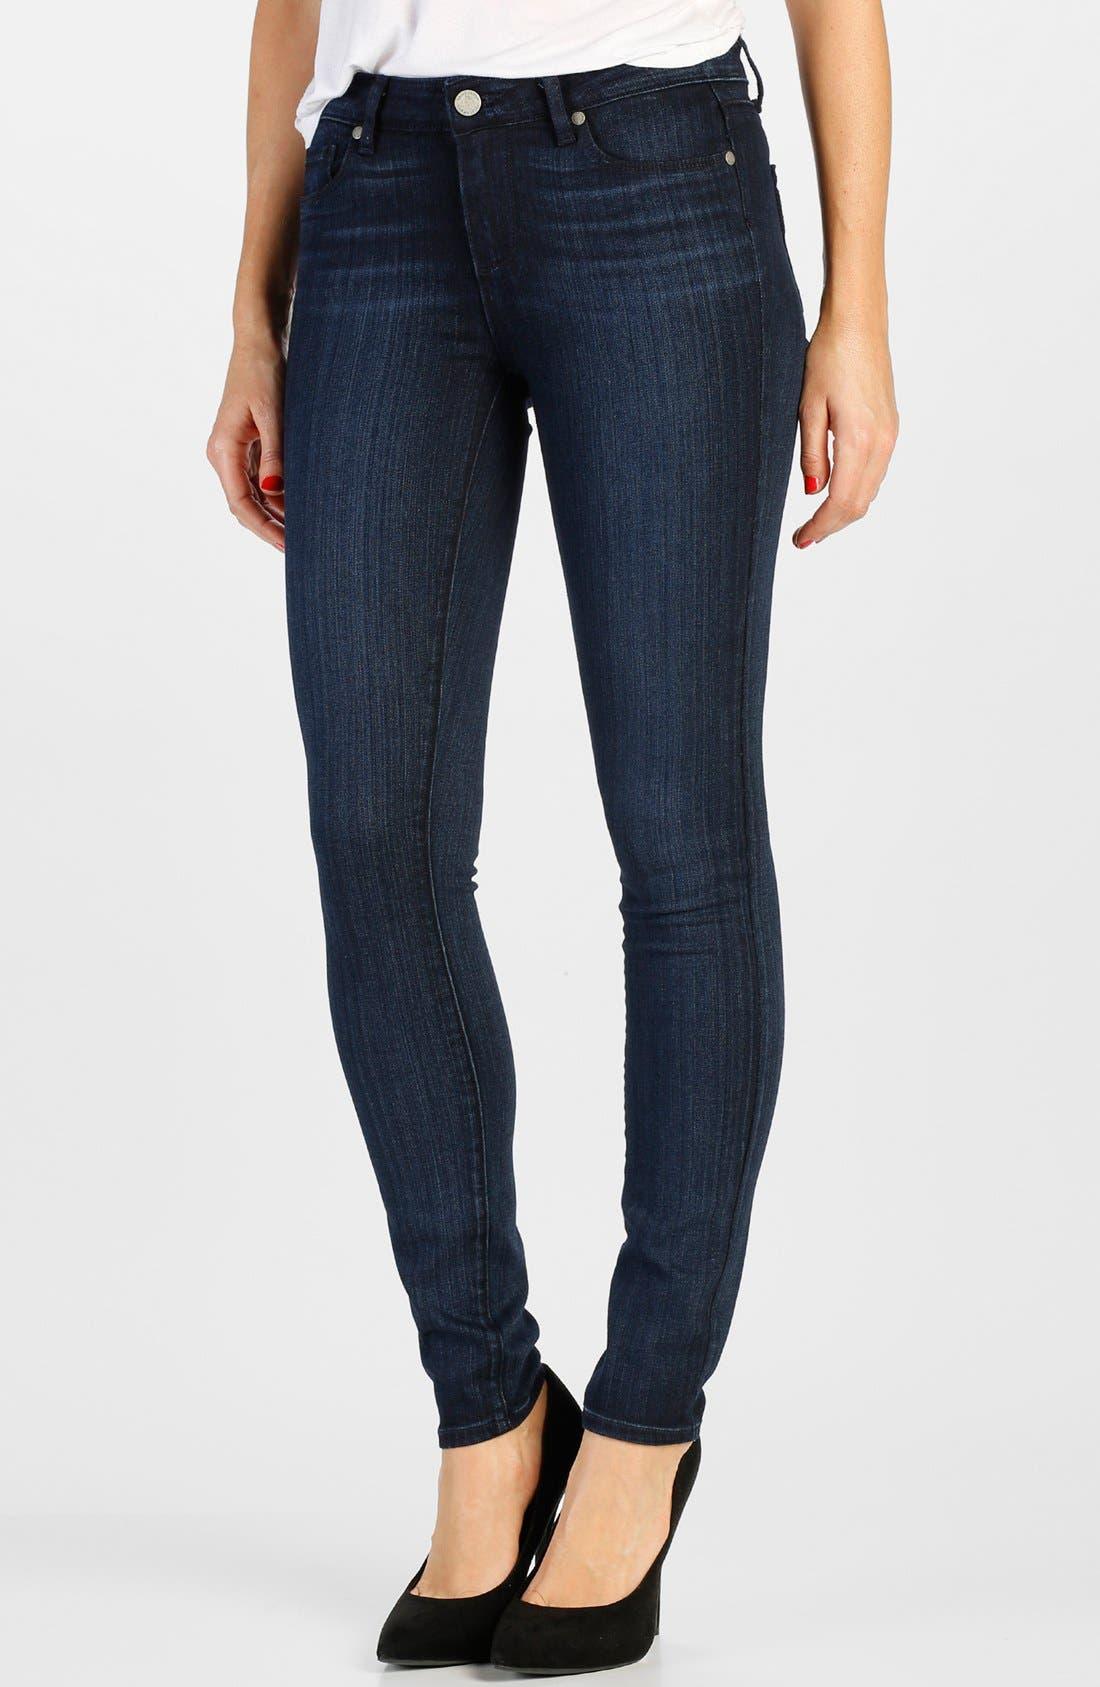 Alternate Image 1 Selected - Paige Denim 'Transcend - Verdugo' Ultra Skinny Jeans (Georgie)